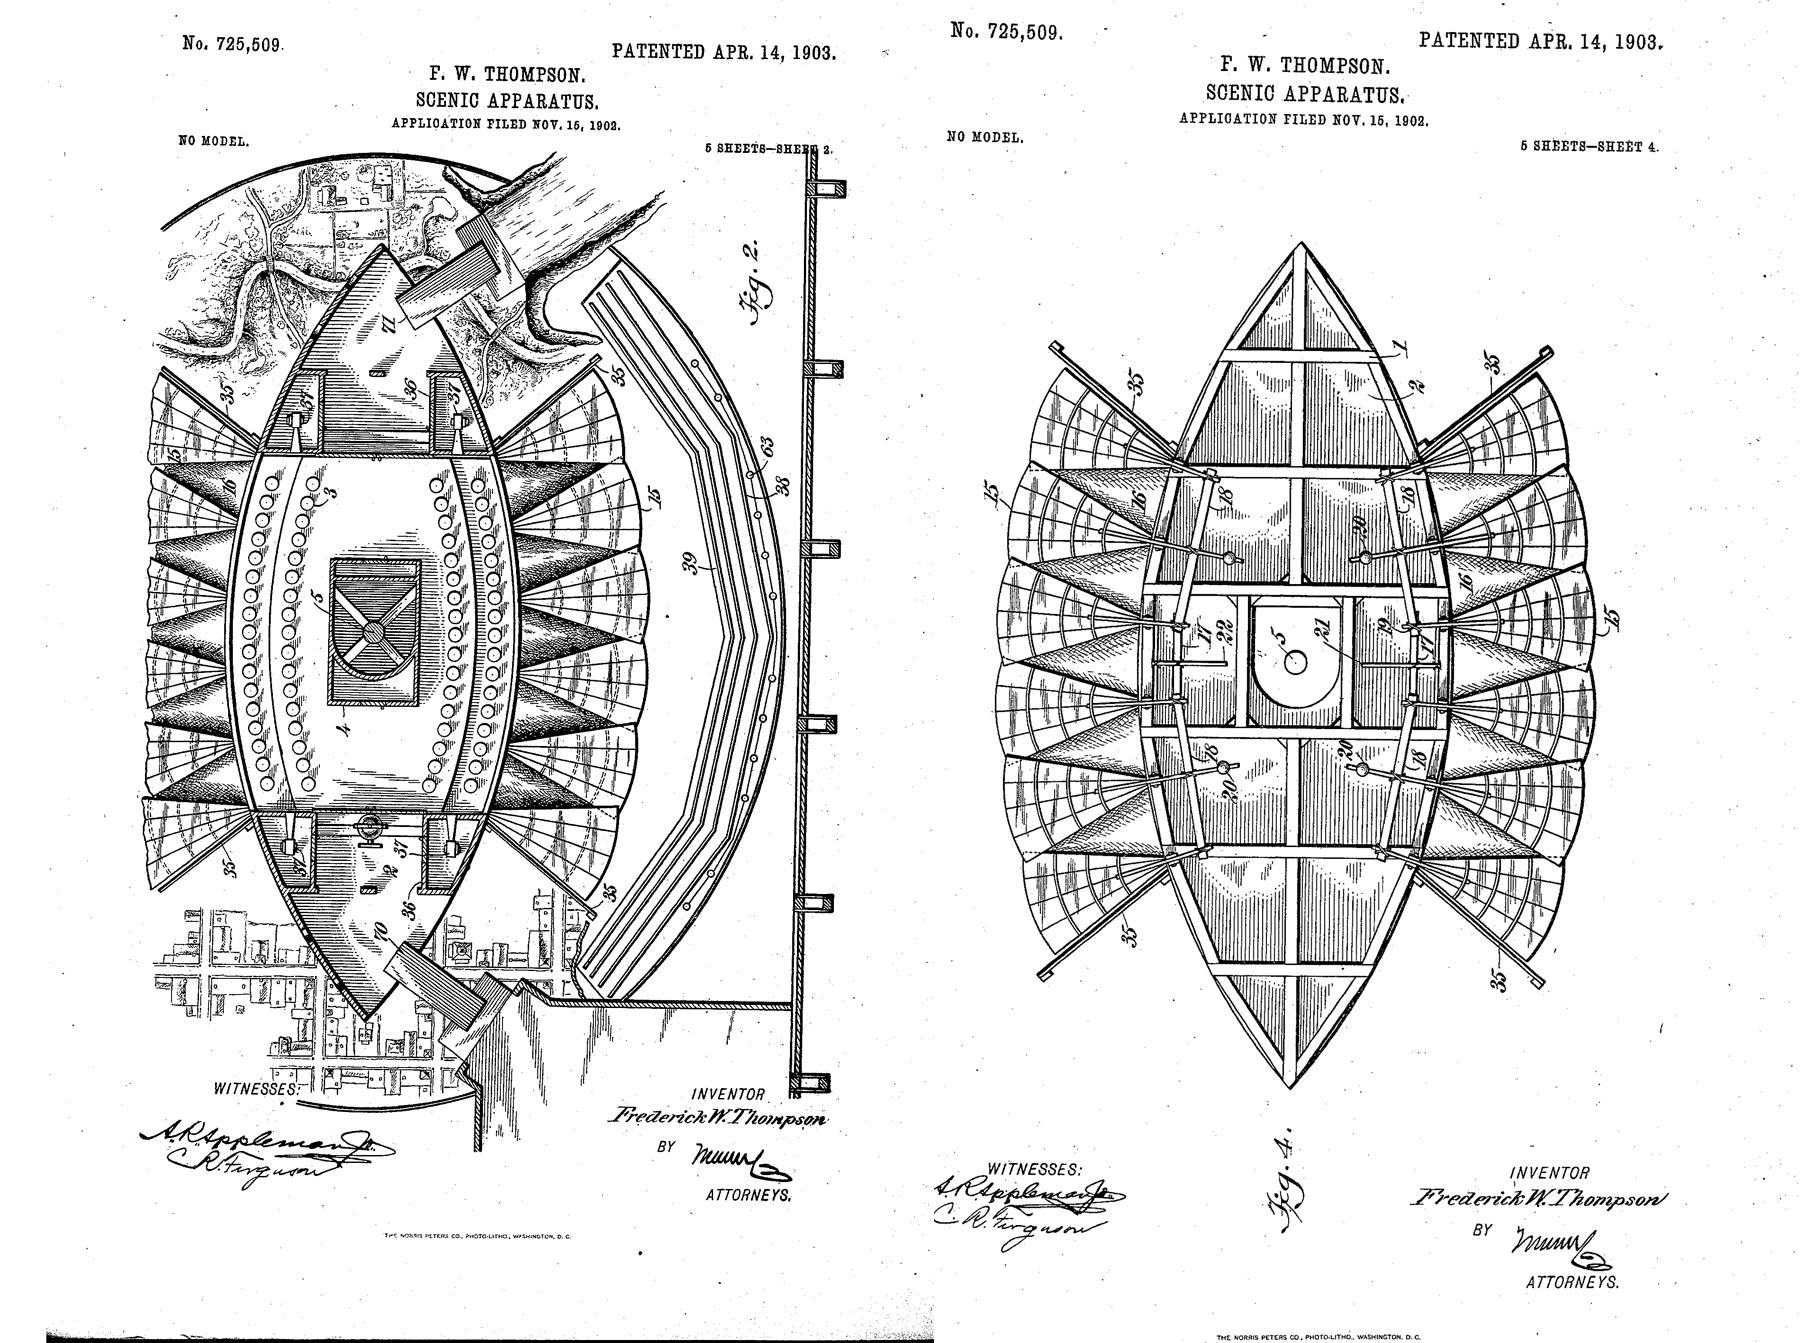 Thompson patent drawings.jpg